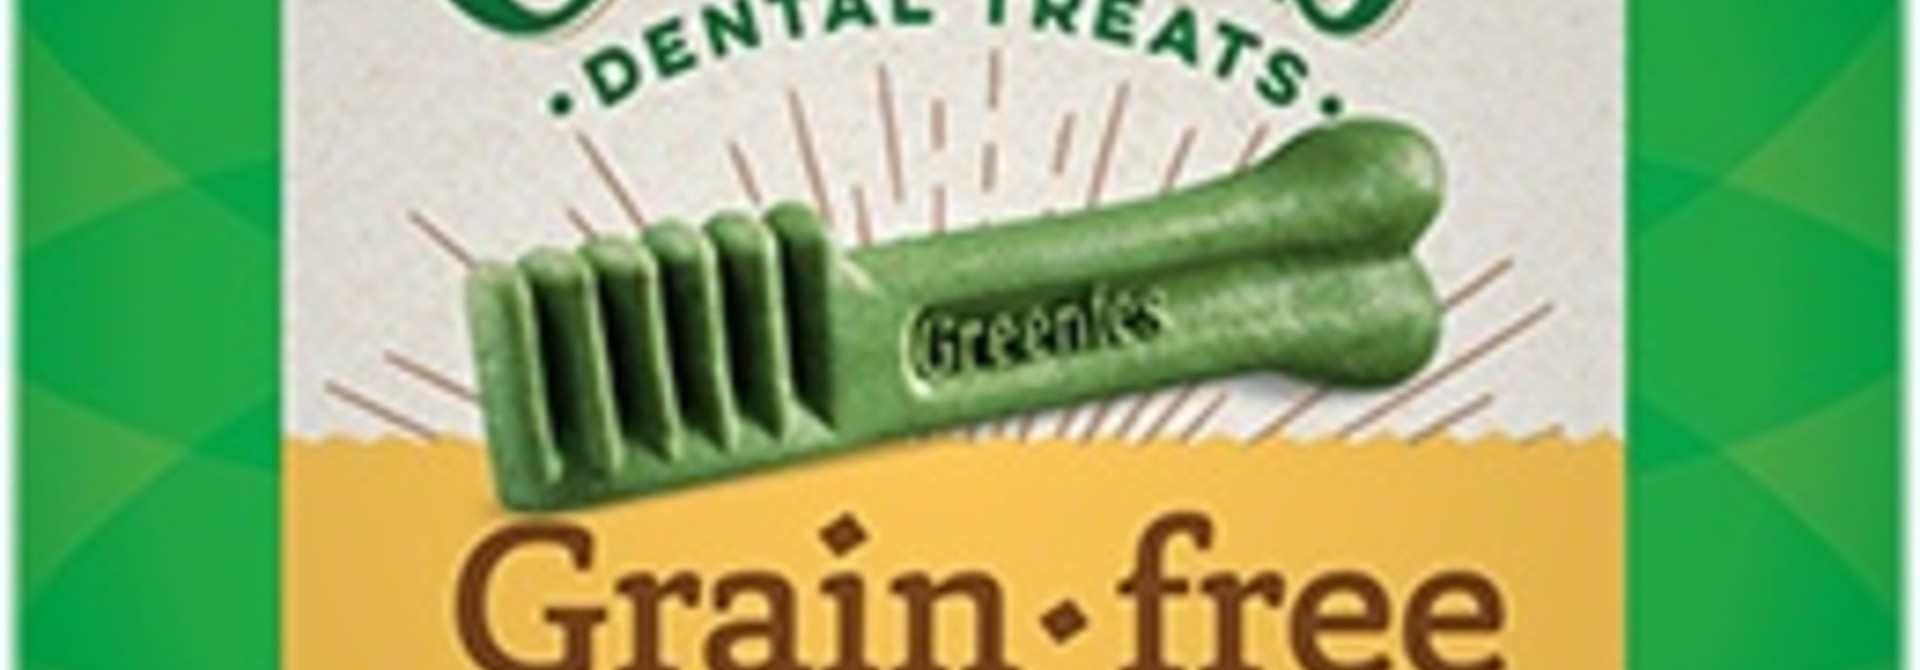 Greenies Grain Free Tub Pack 27/Reg 27OZ